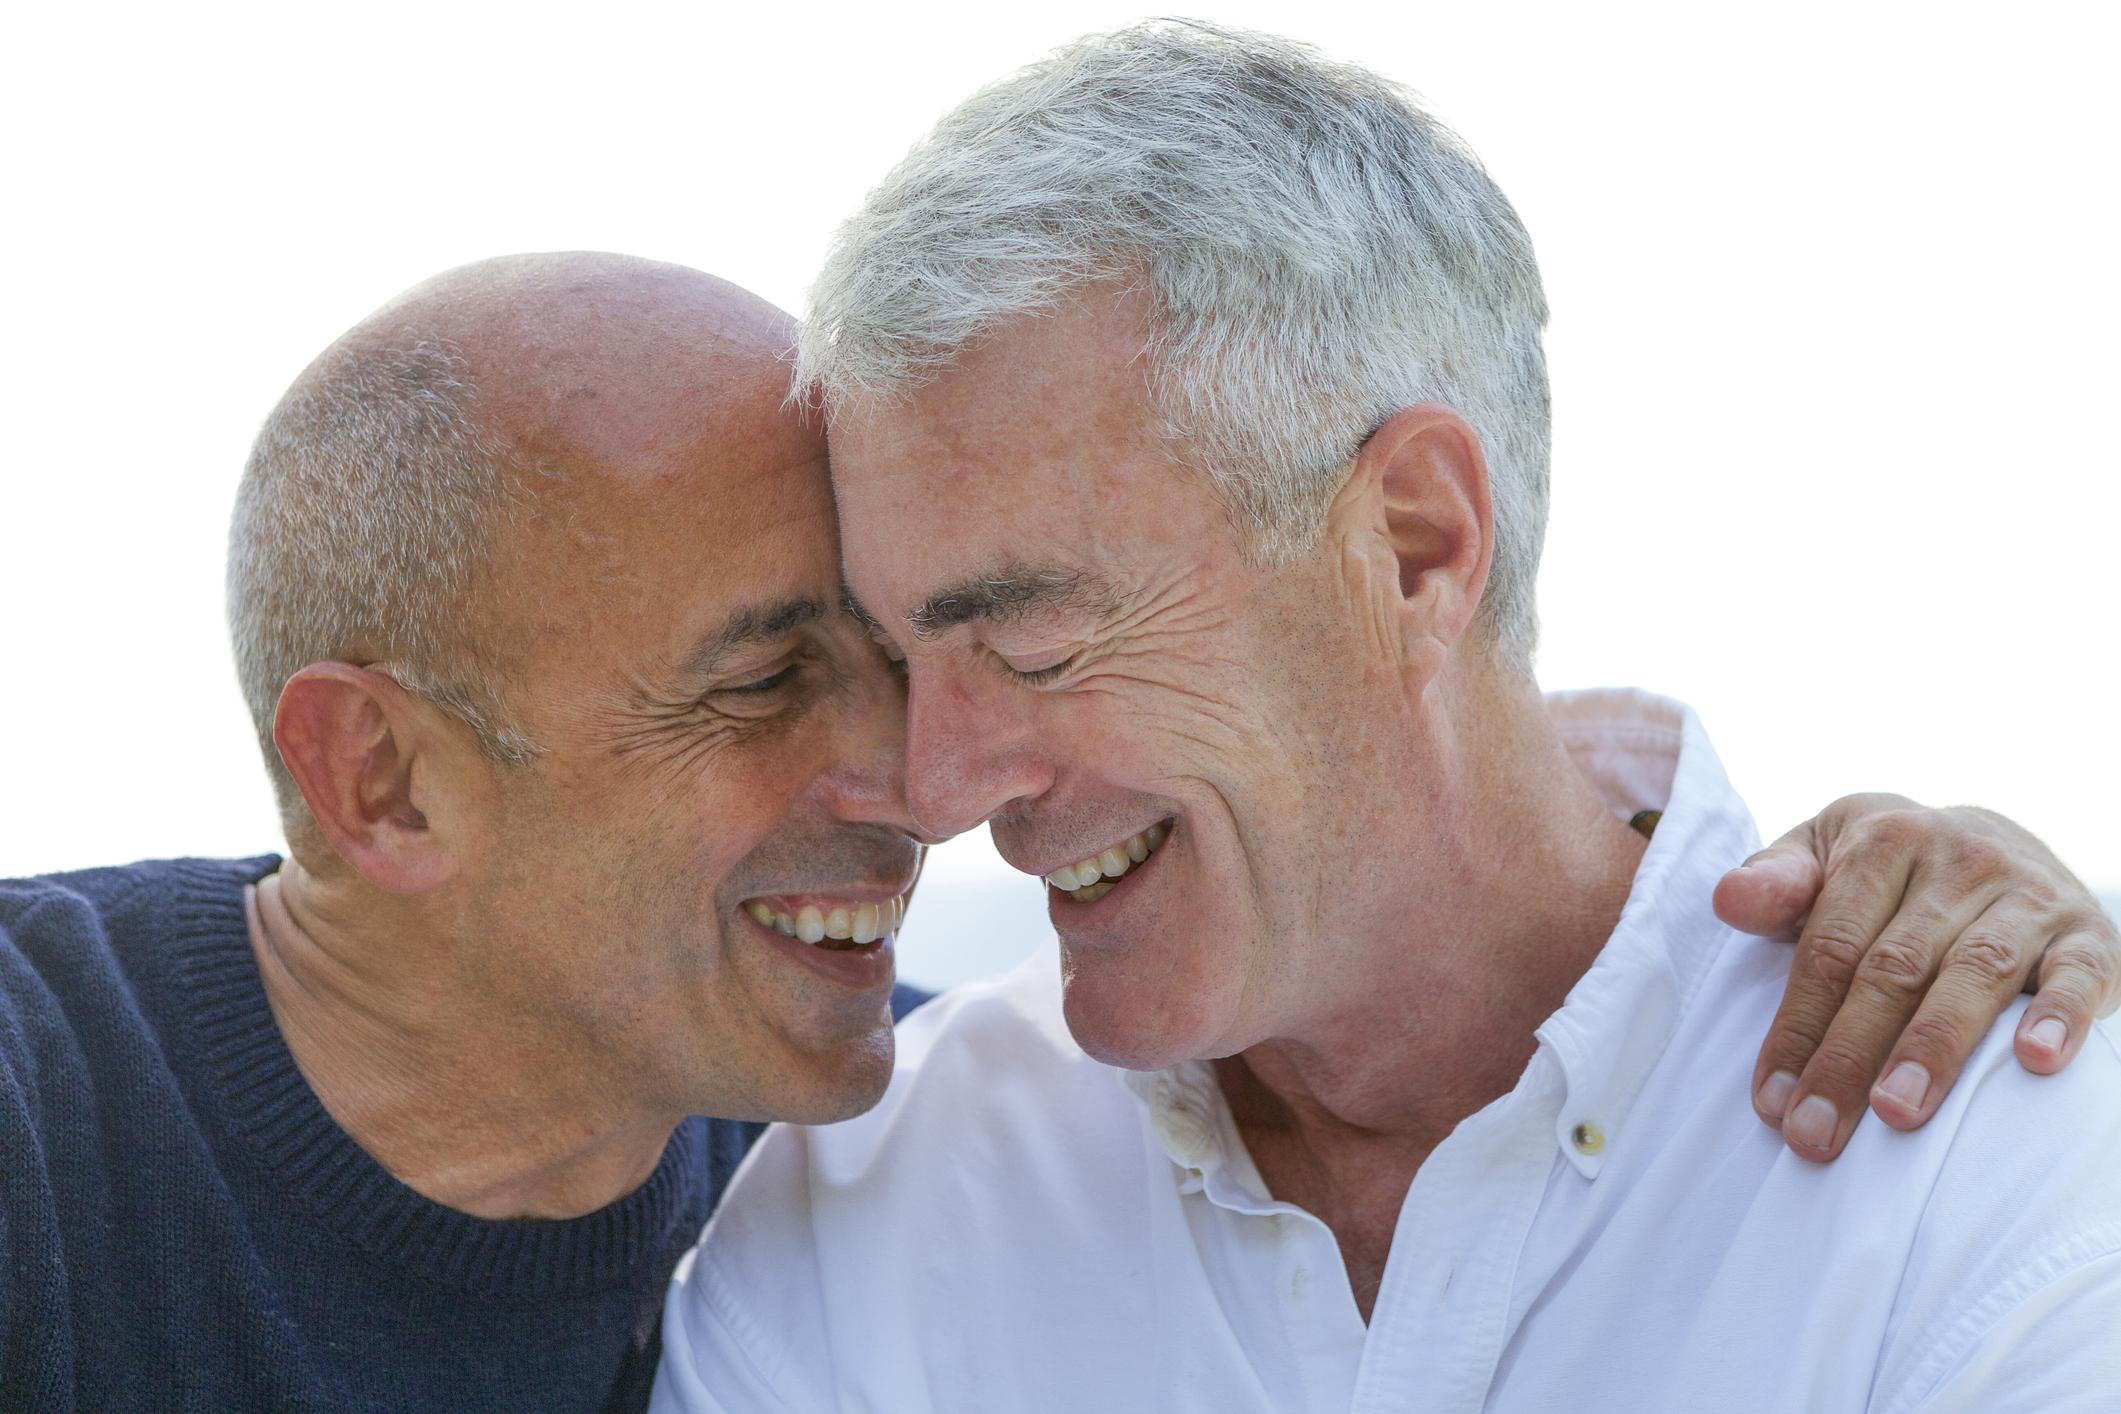 Devon gay dating personals